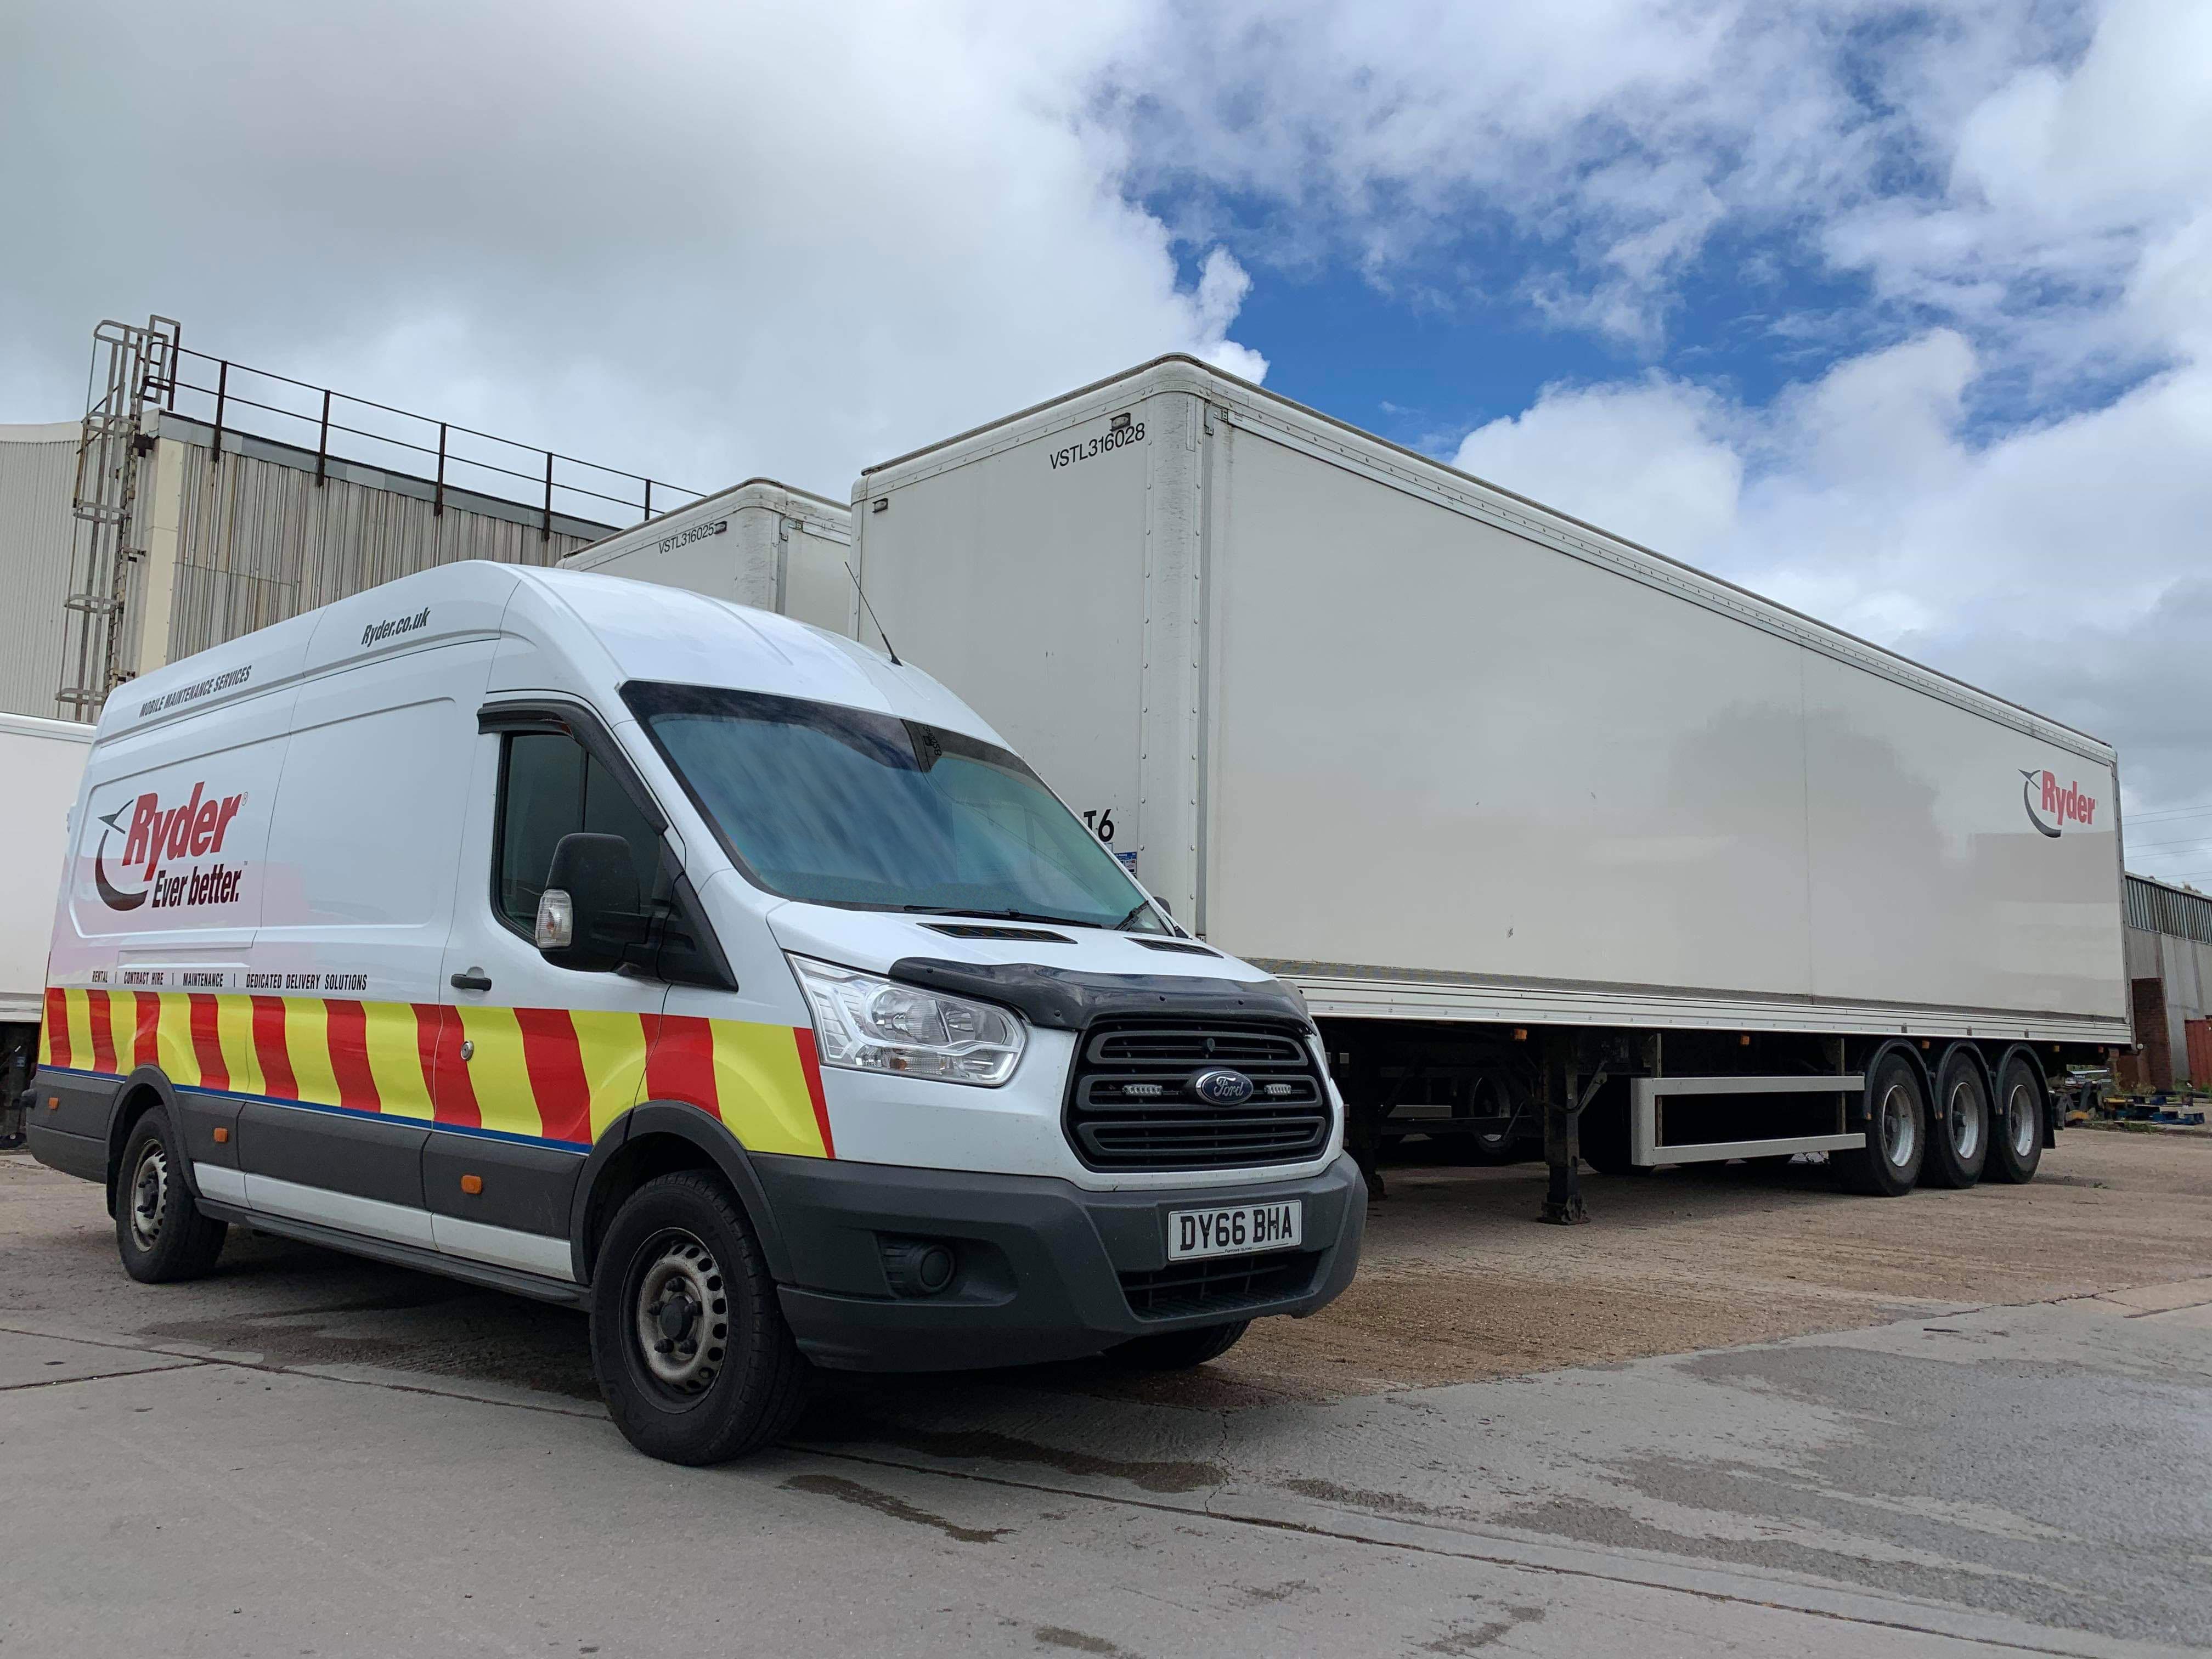 Ryder van and trailer